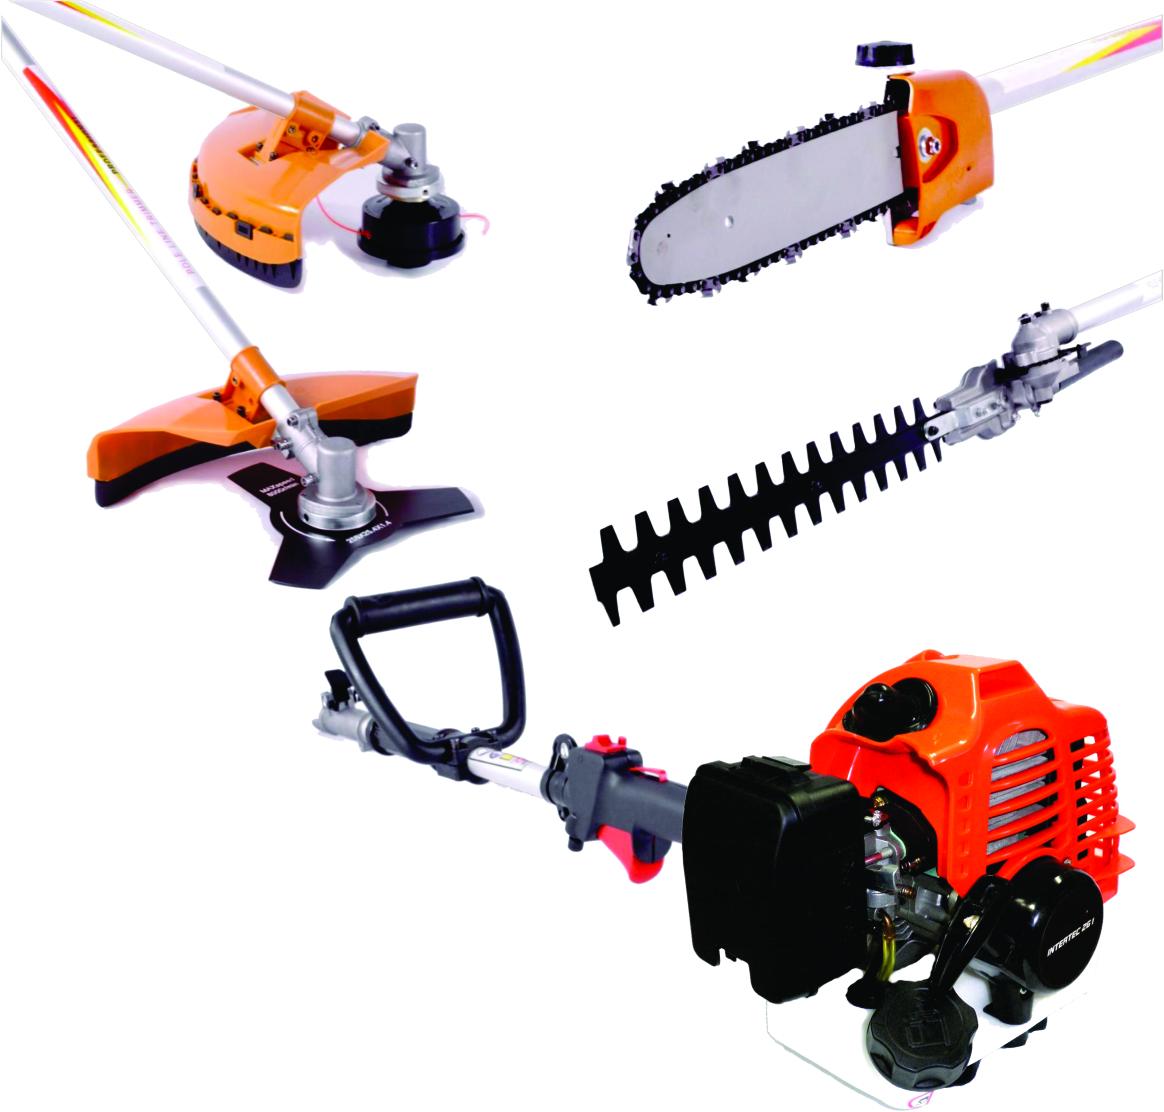 Comprar Multi tool intertec 3x1 - 261